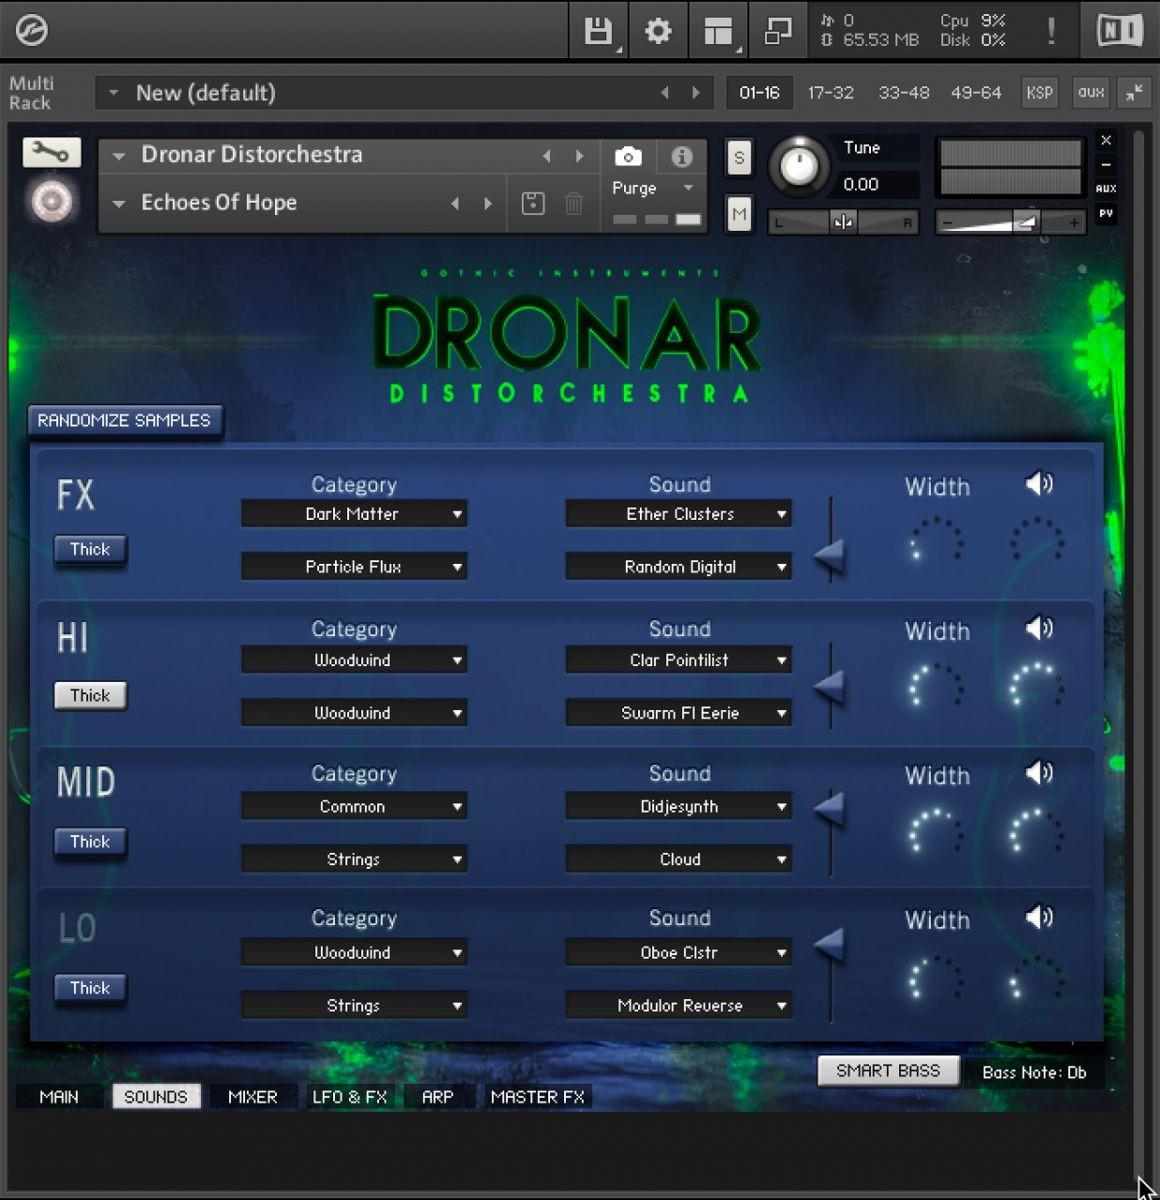 Dronar Distorchestra